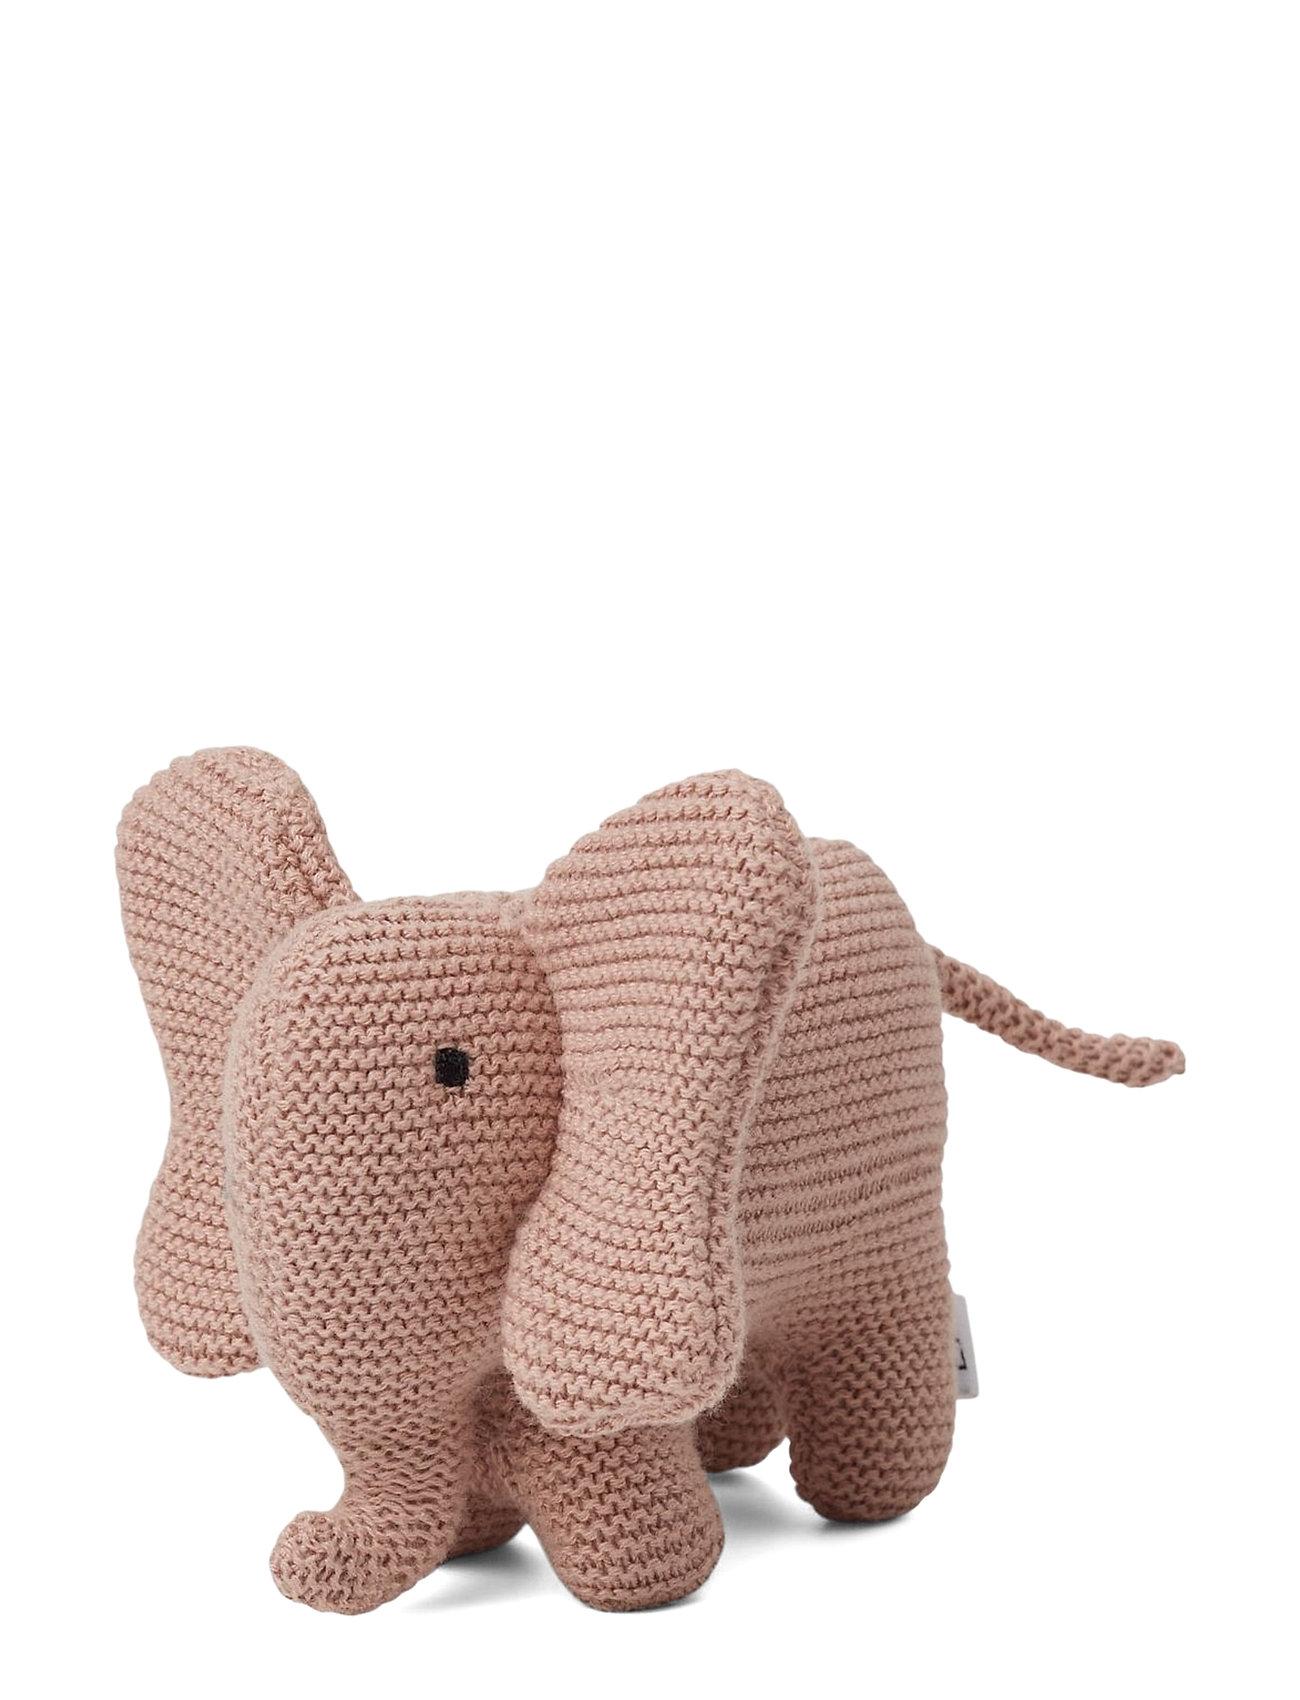 Liewood Vigga knit mini teddy - ELEPHANT ROSE